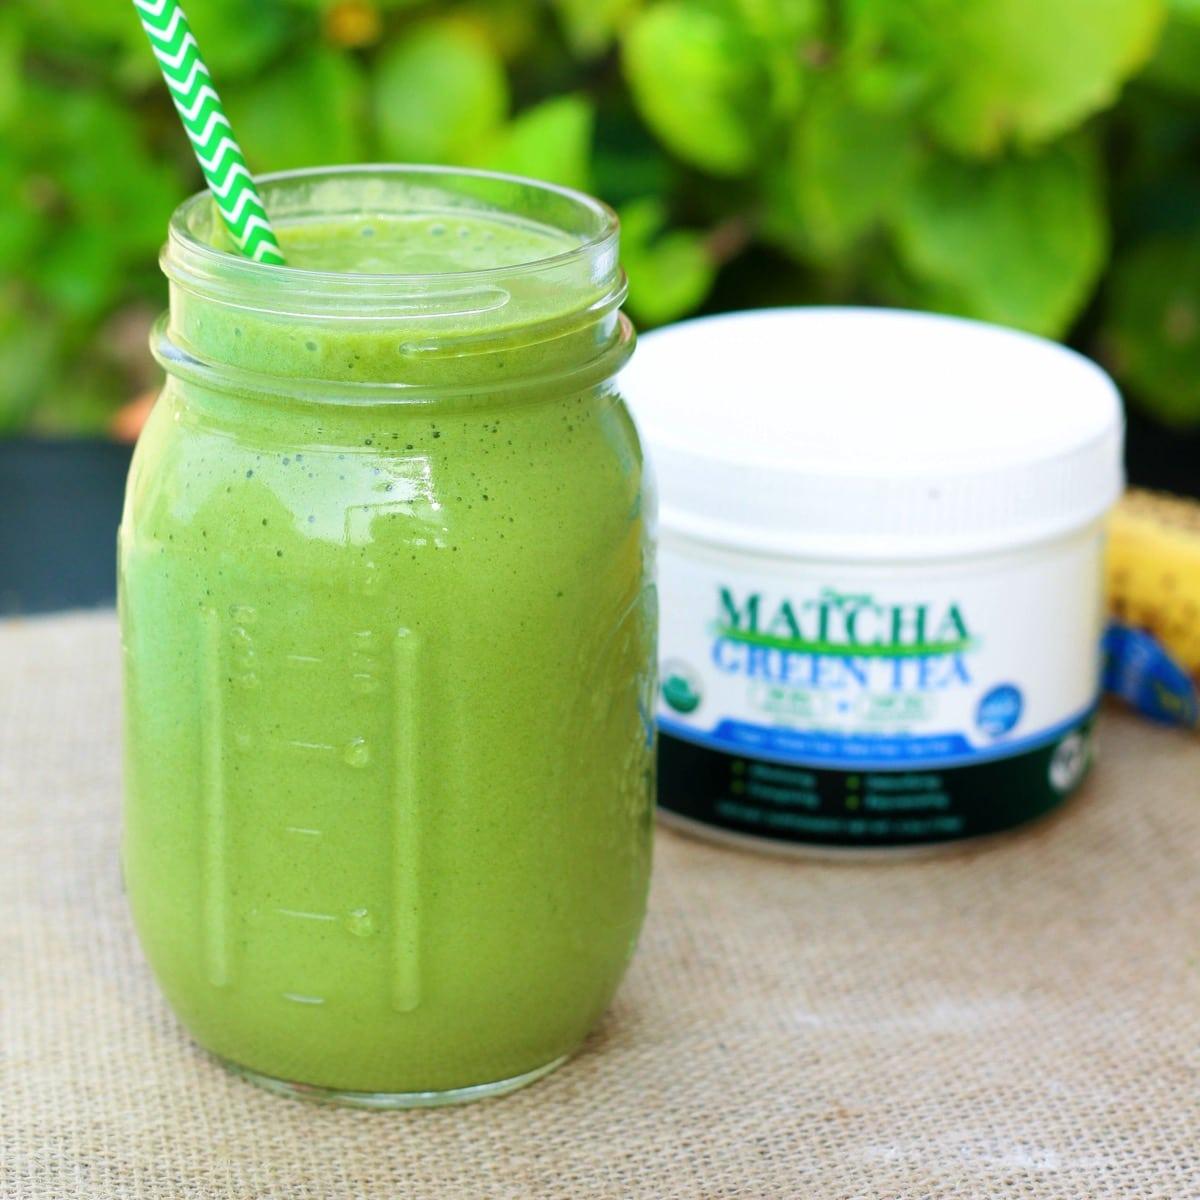 Matcha green tea smoothie square